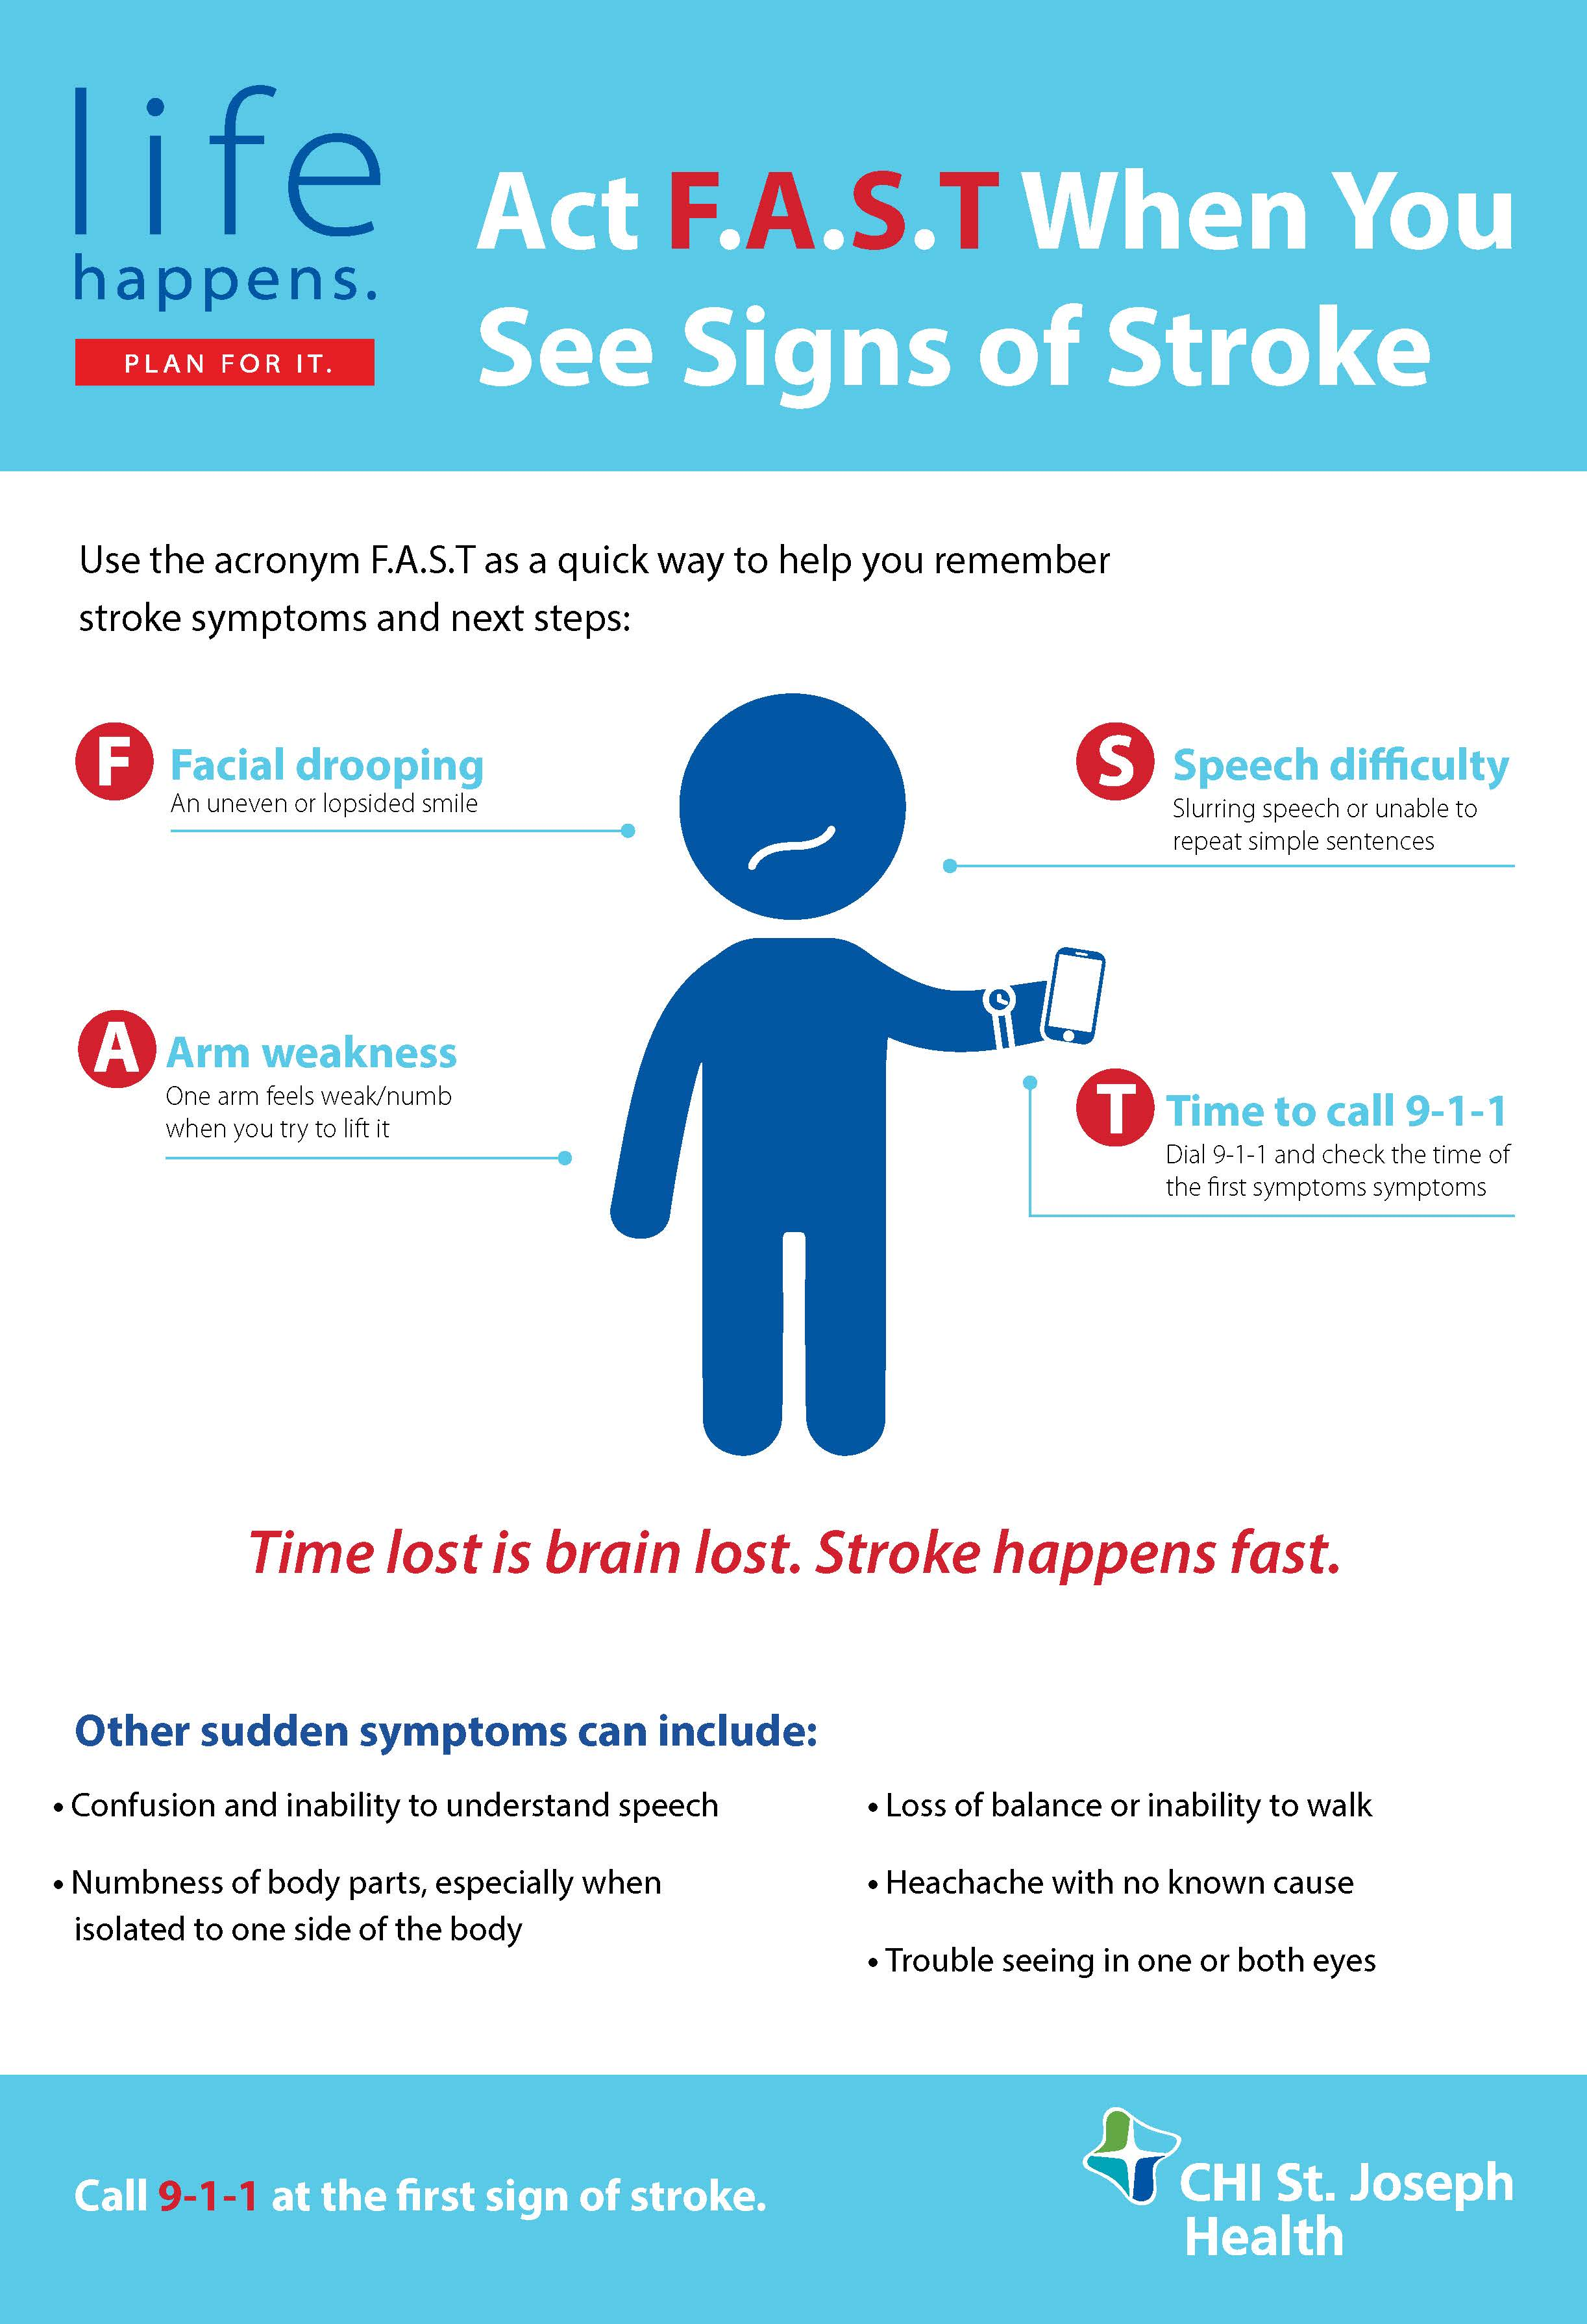 CHISJH-PFI-Stroke Infographic_Page_1.jpg